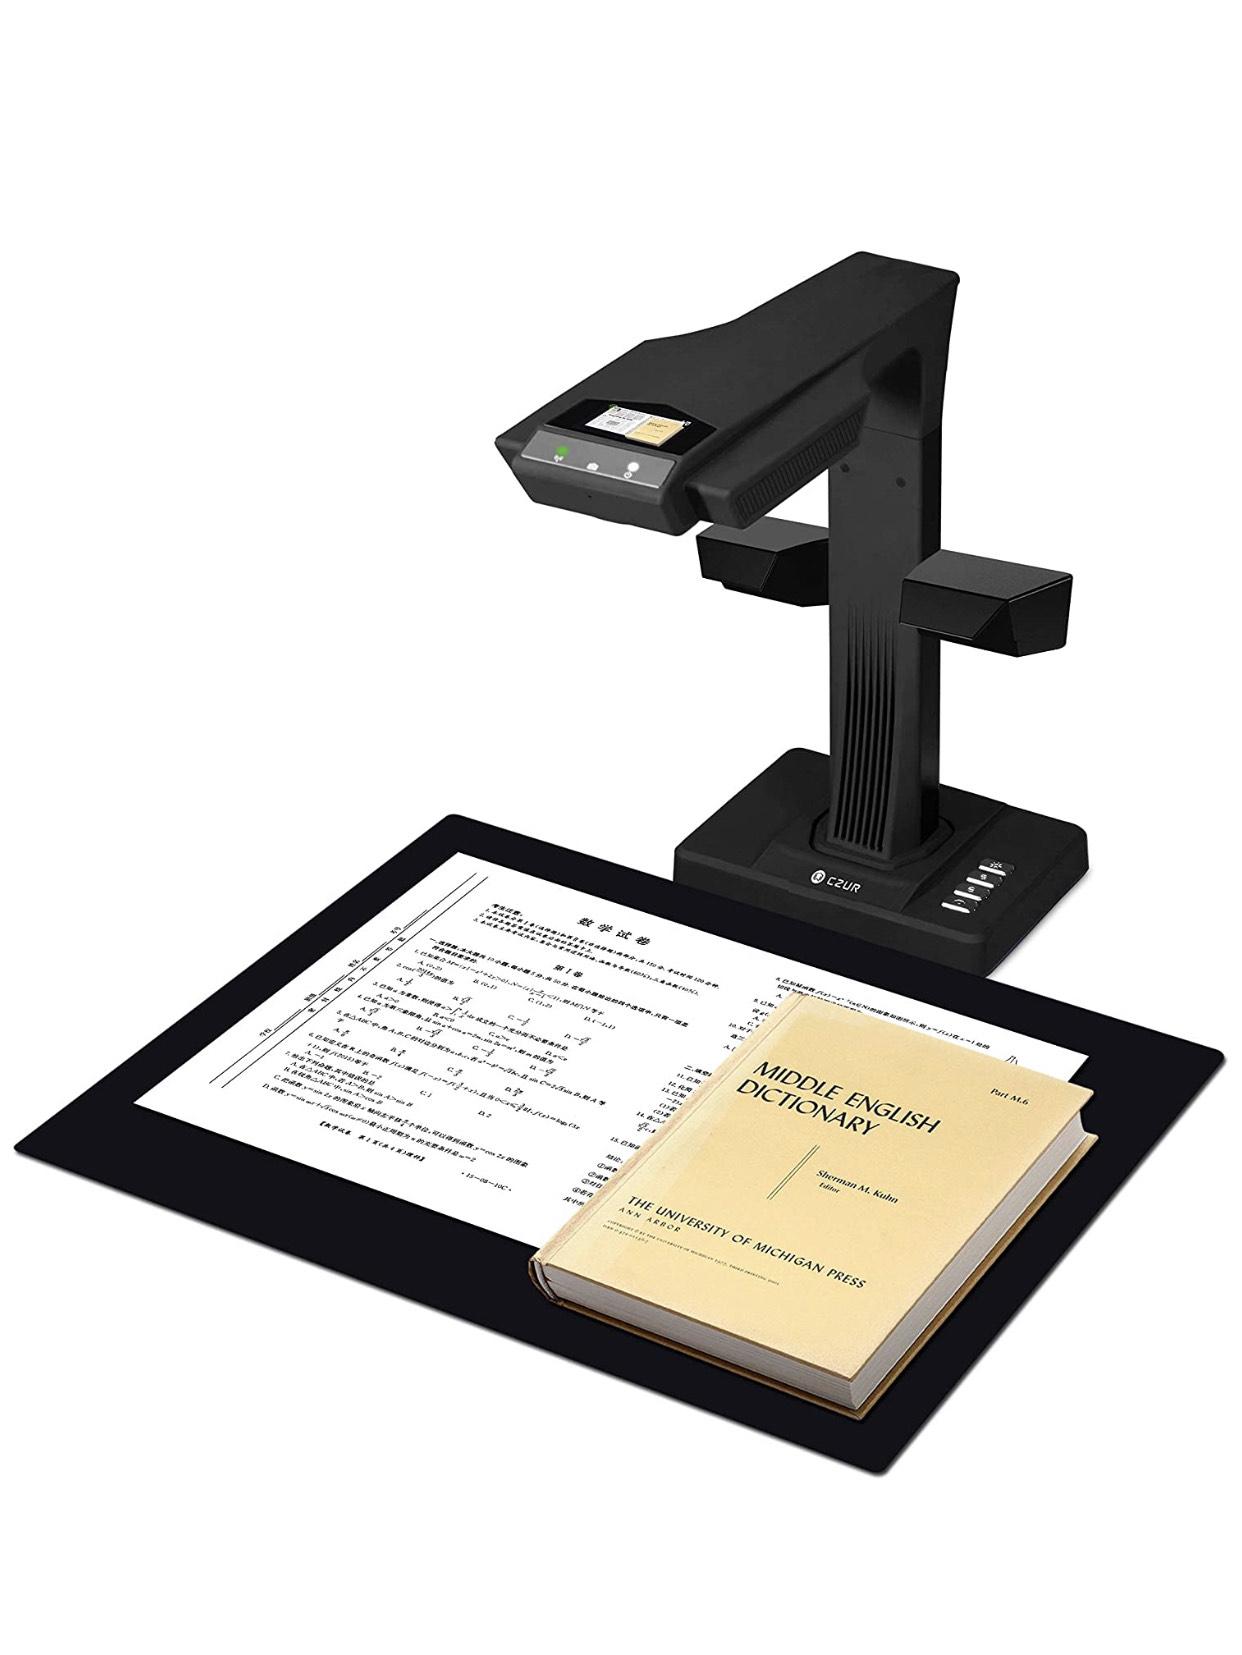 CZUR ET18-P Escáner de Libros Profesional